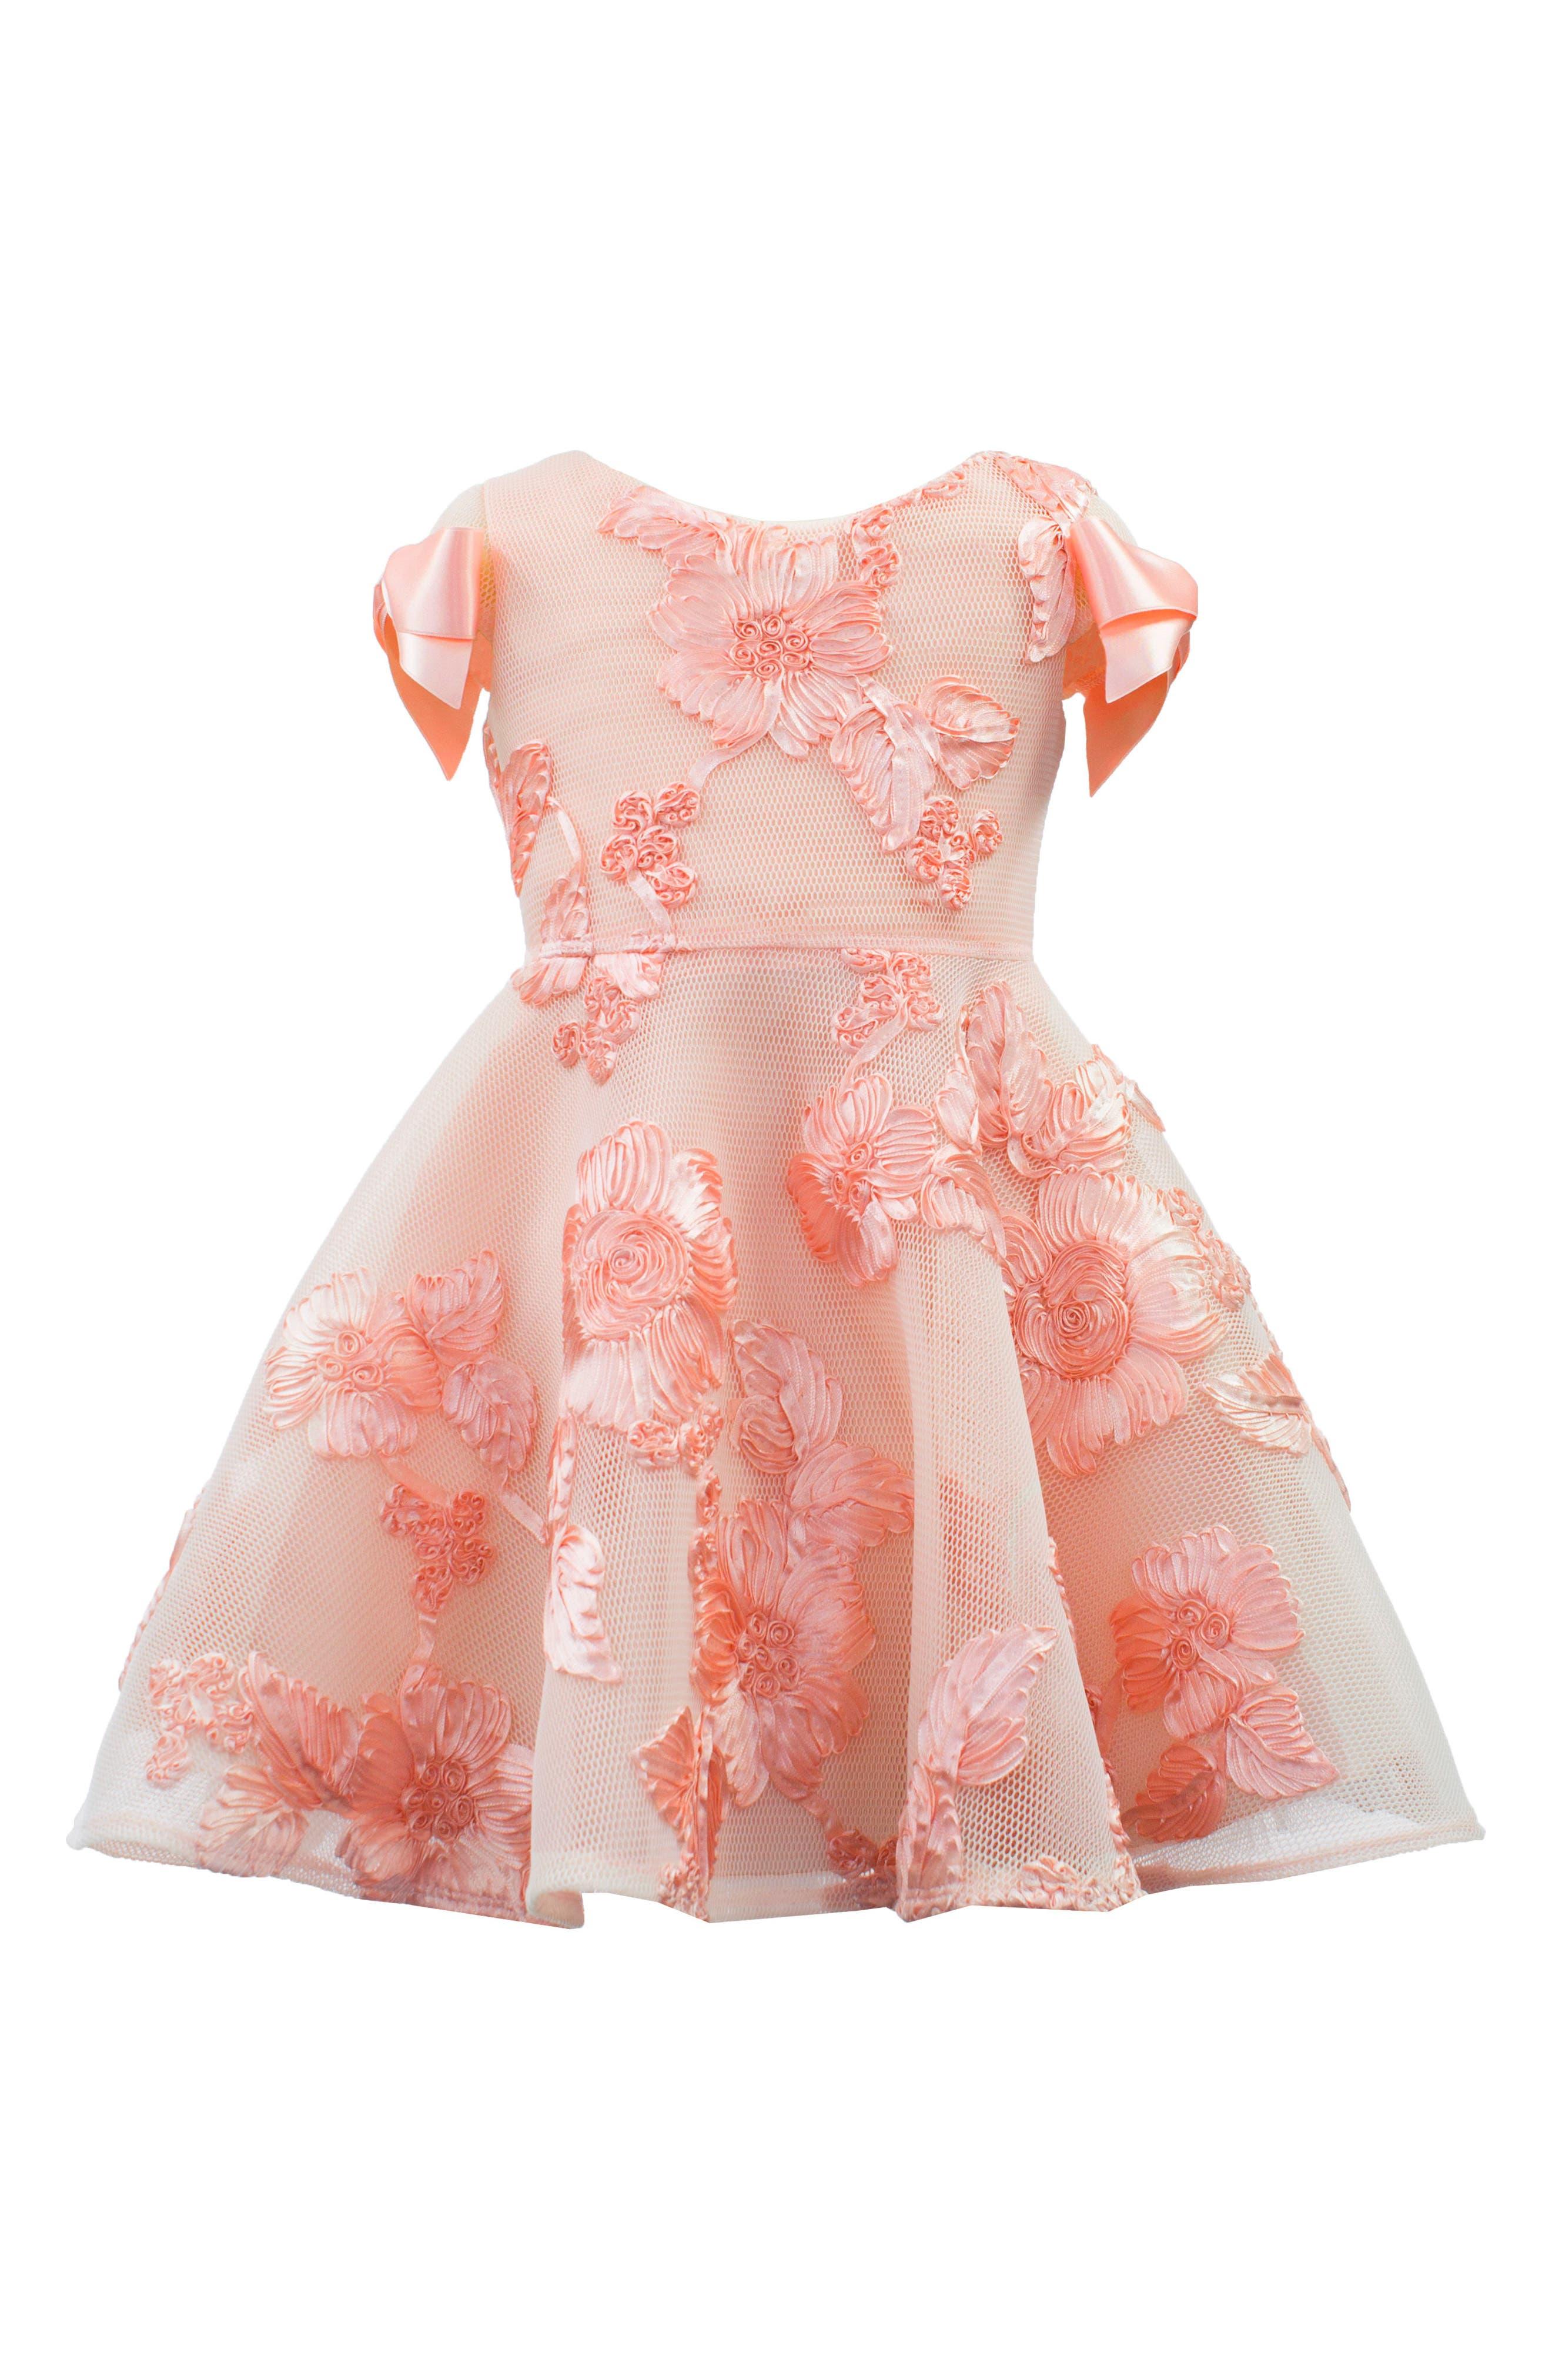 Soutache Embellished Mesh Dress,                             Main thumbnail 1, color,                             Blush Pink